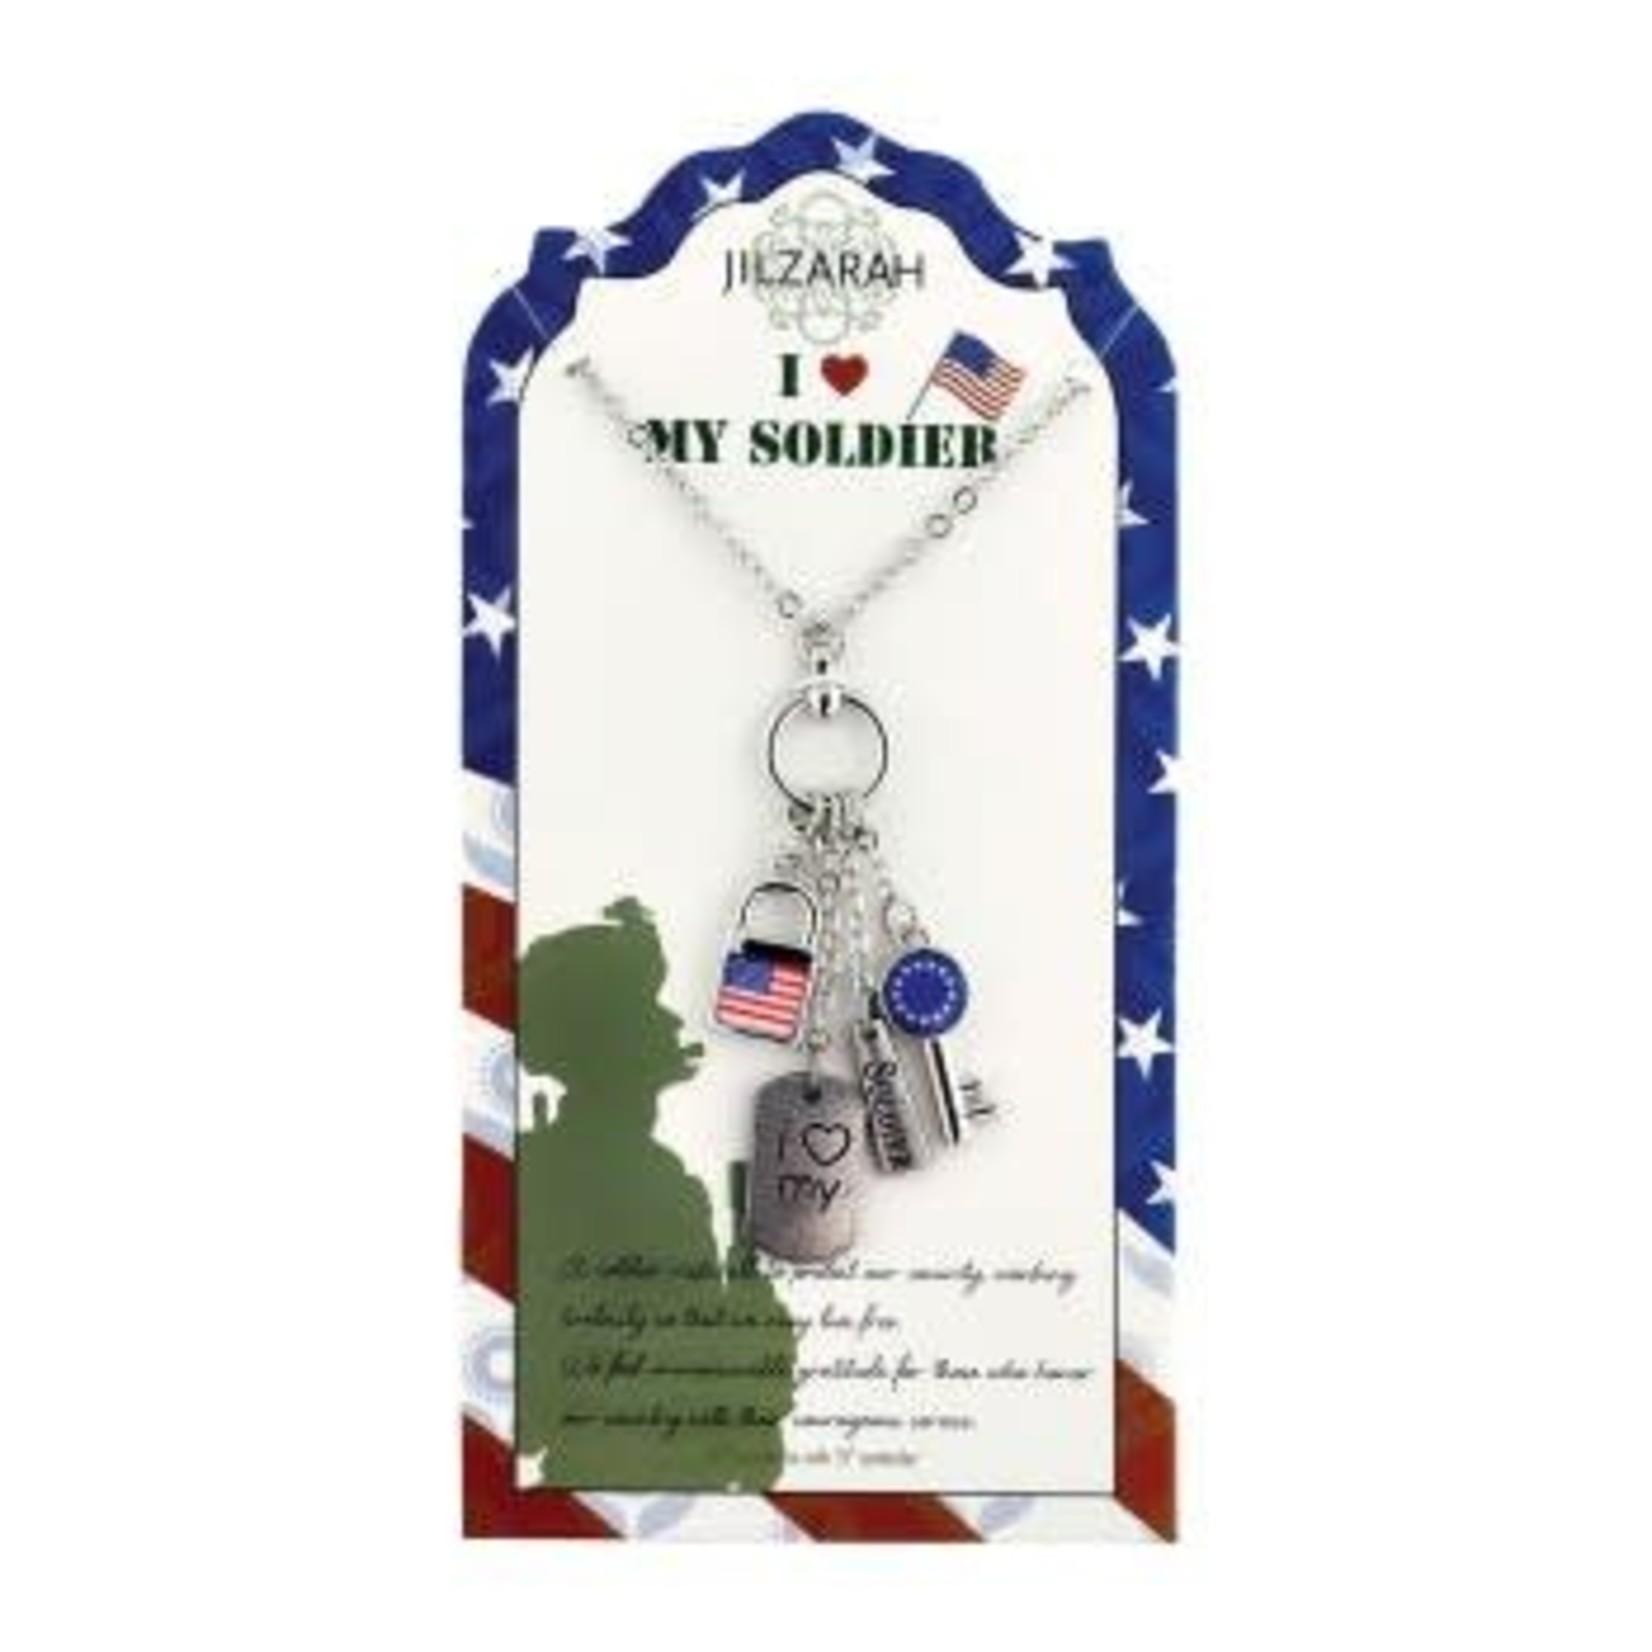 Jilzarah 901-023 My Soldier Necklace People We Love